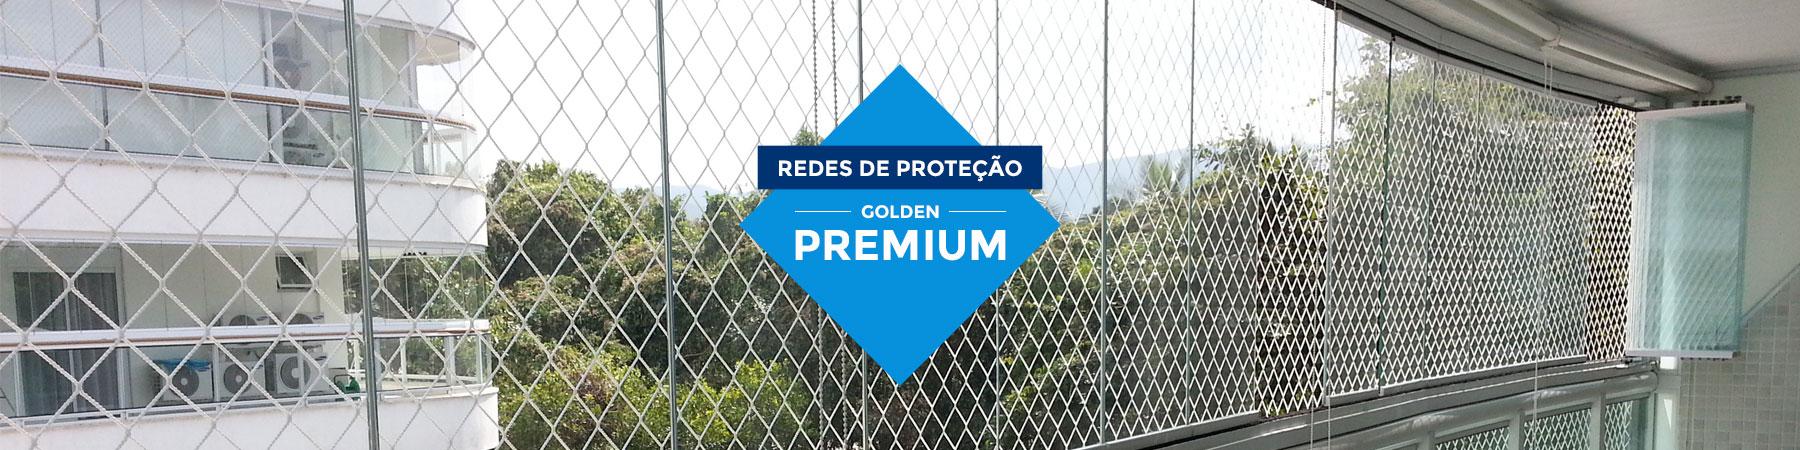 rede-de-protecao-golden-premium01